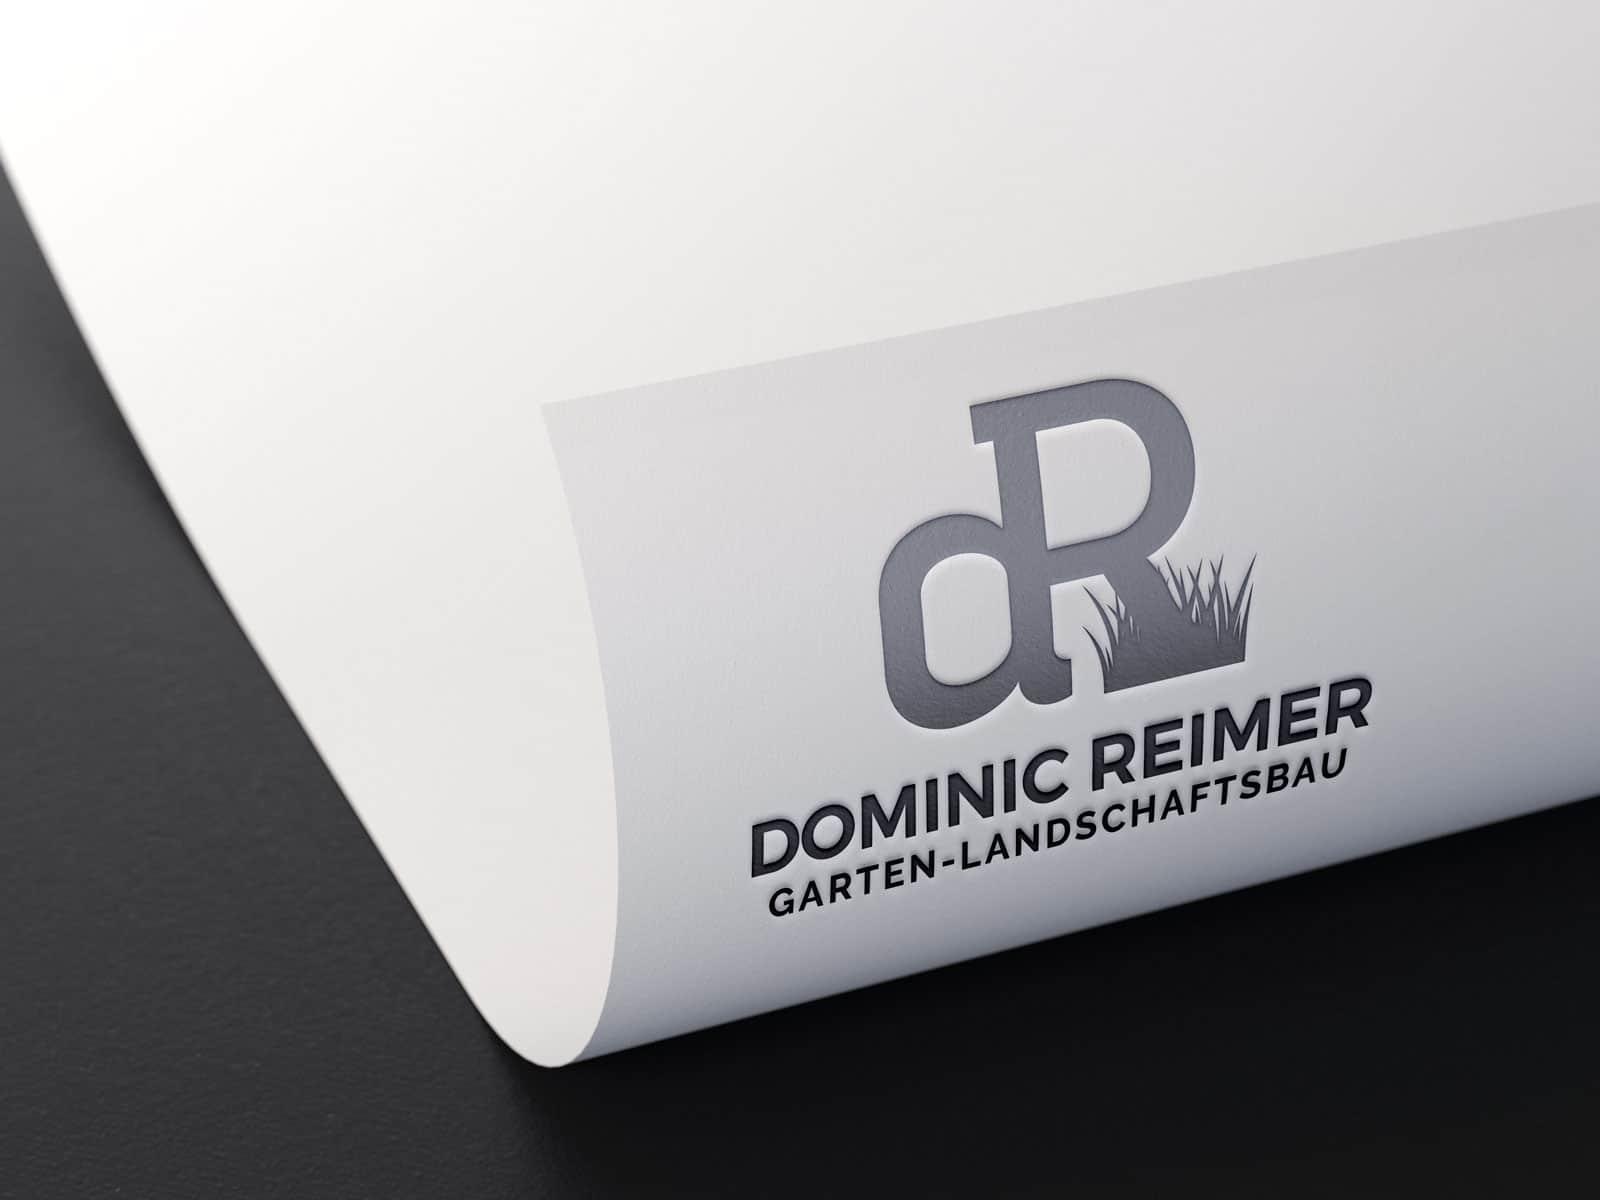 agentur-liebespixel-grafik-dr-logo-dominic-reimer-landschaftsbau-garten